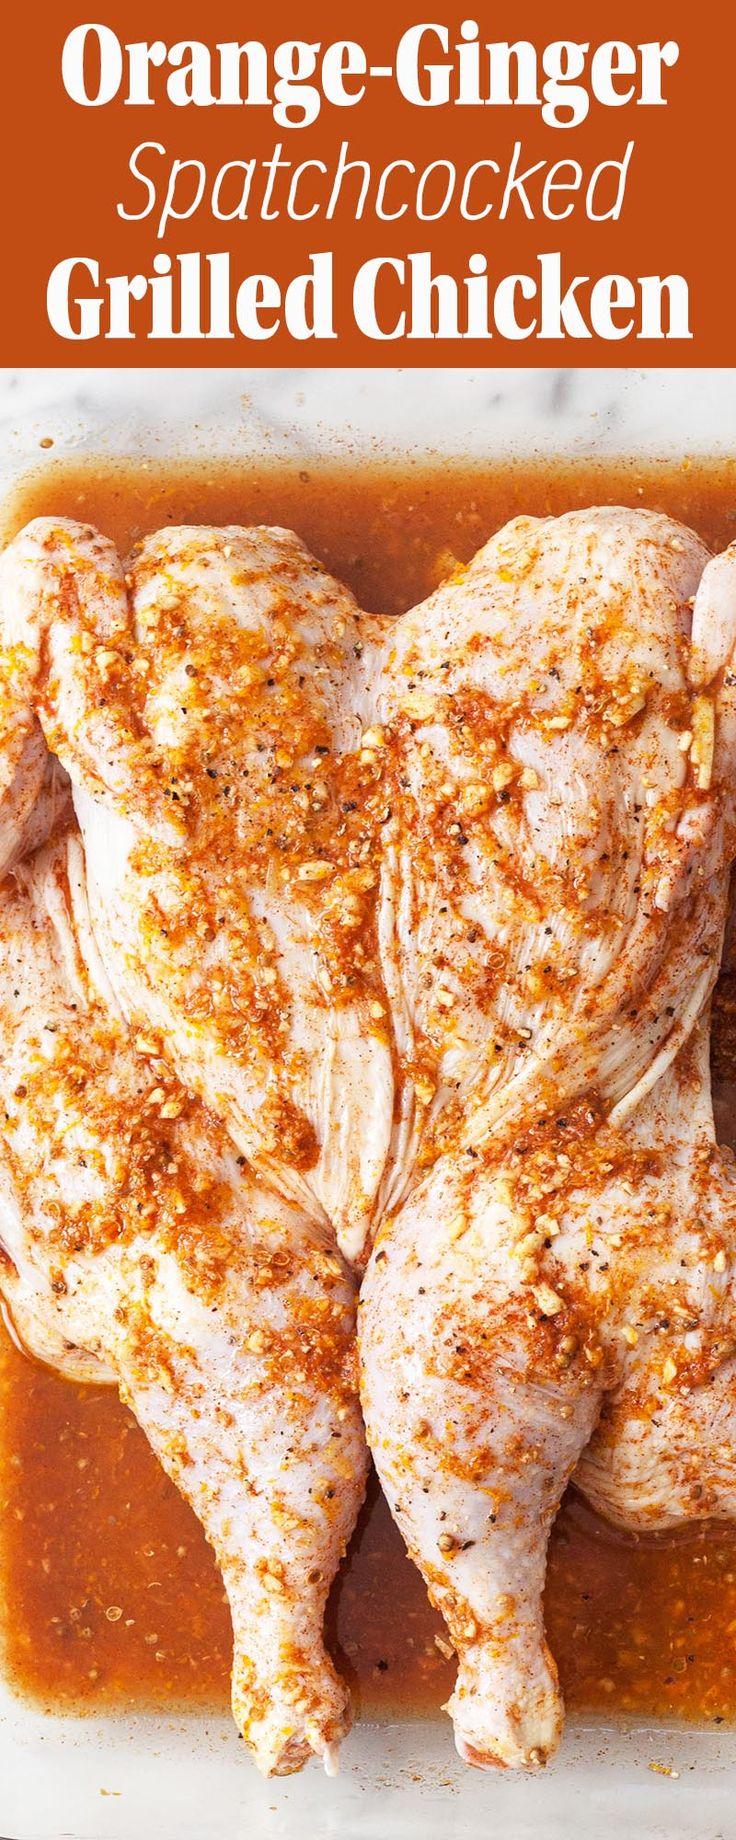 Orange-Ginger Chicken, spatchcocked and grilled!